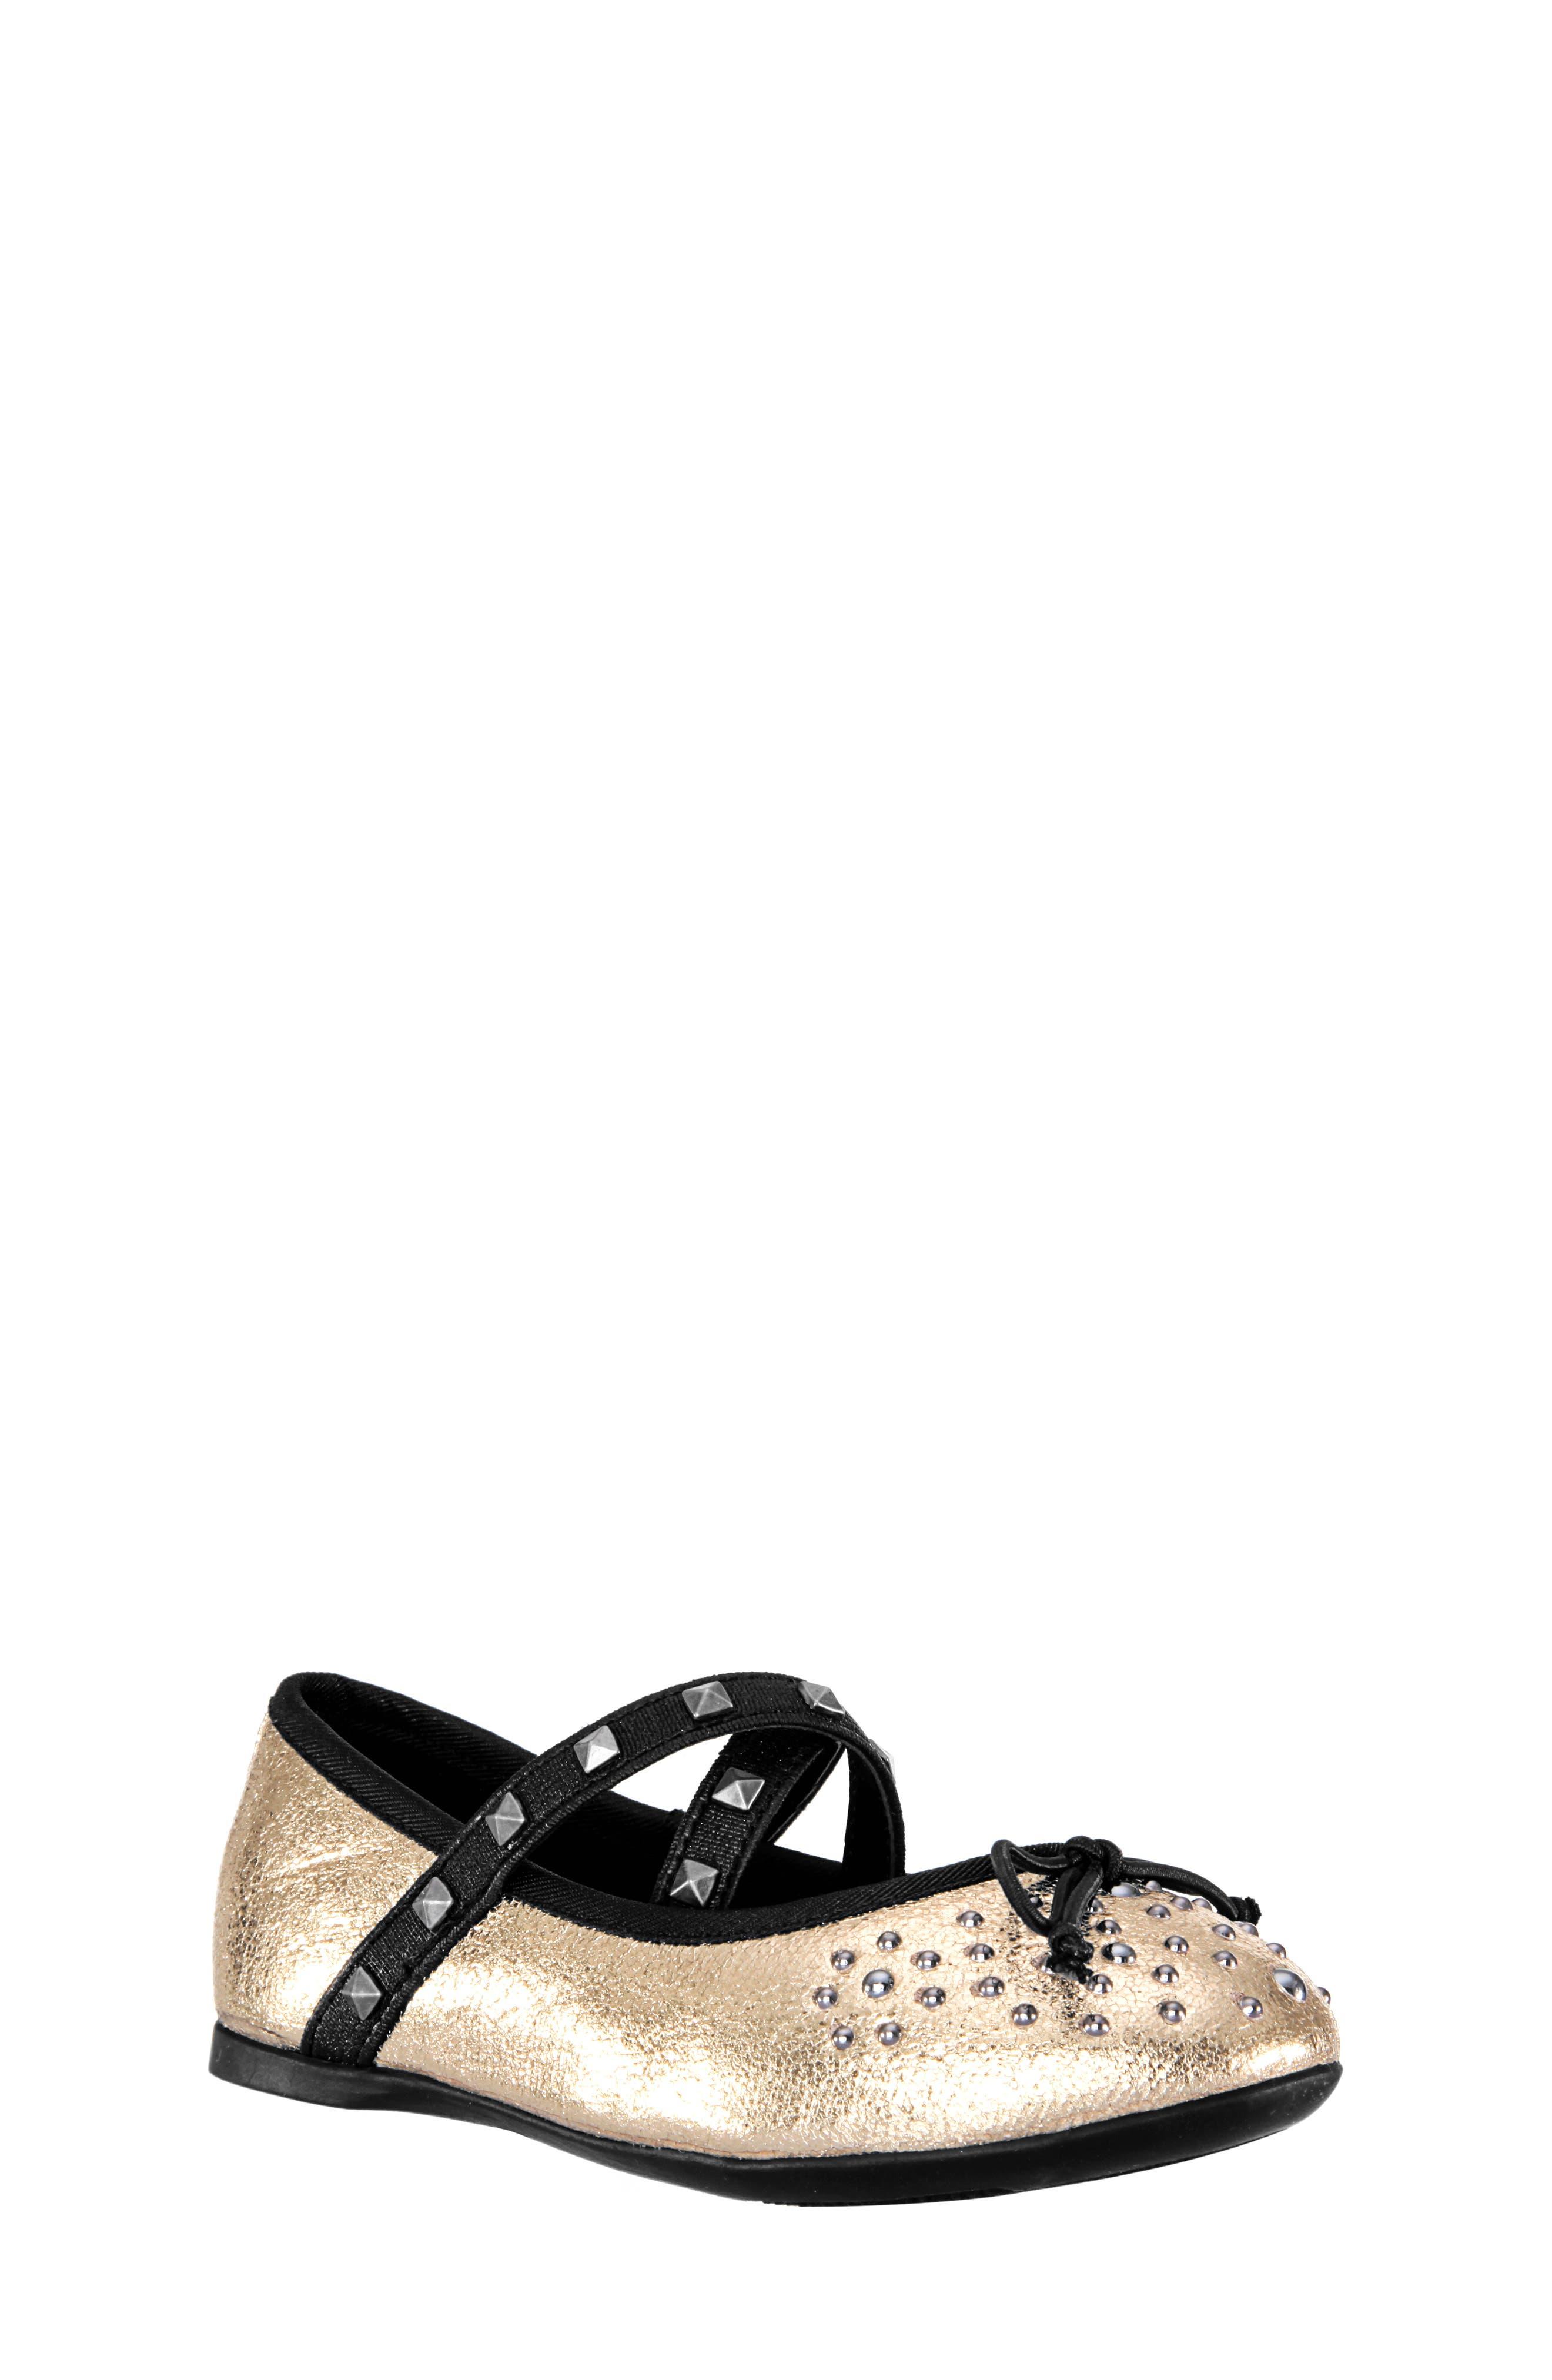 Averi Studded Ballet Flat,                         Main,                         color, GOLD CRACKLE METALLIC